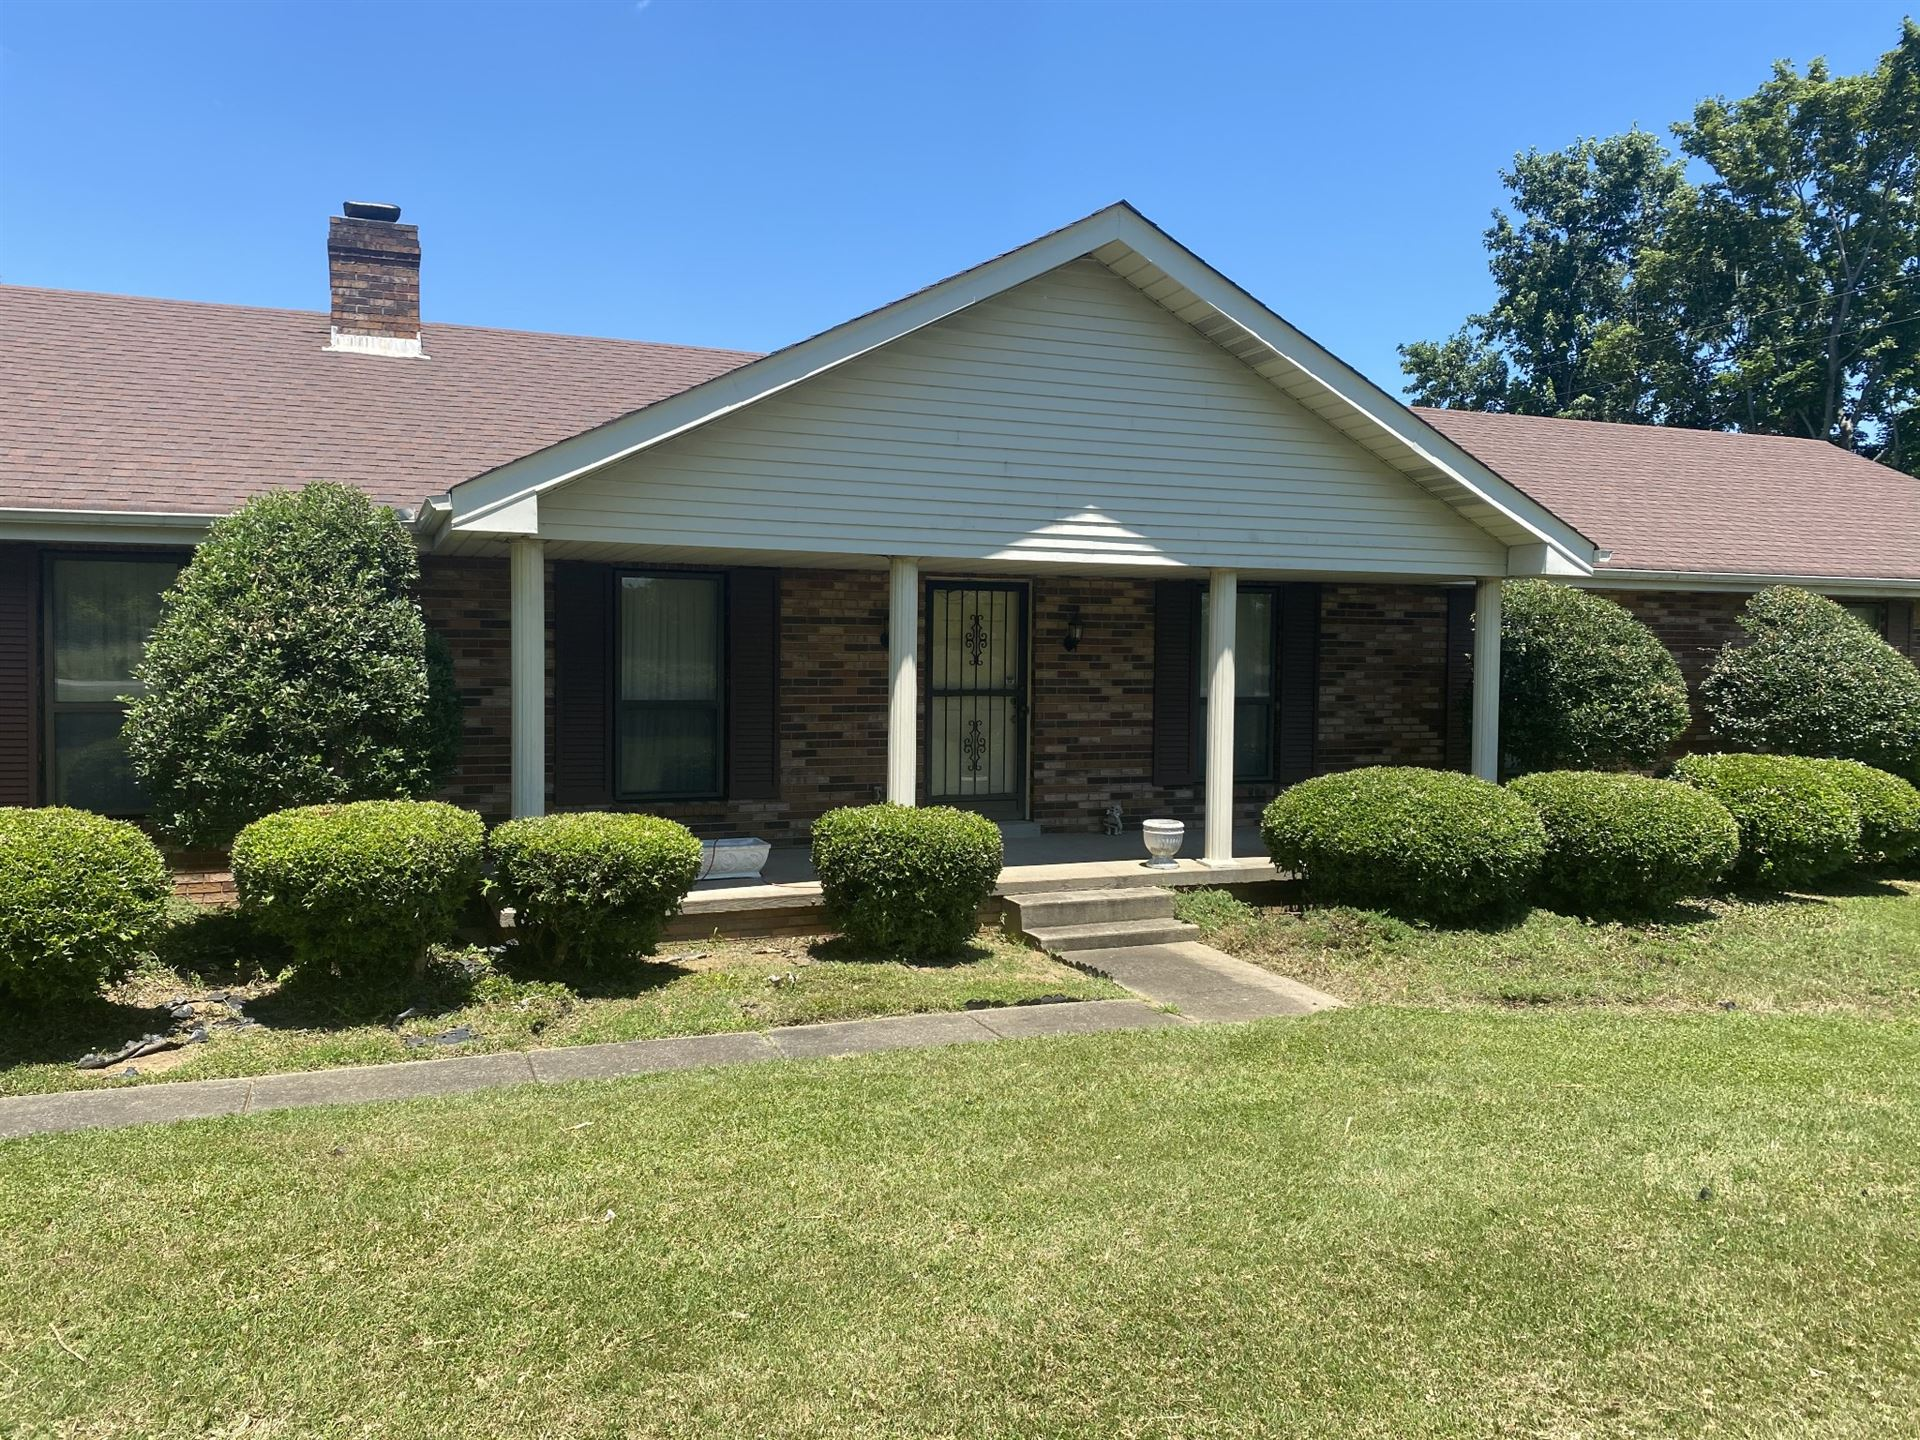 362 Haywood Ln, Nashville, TN 37211 - MLS#: 2263745